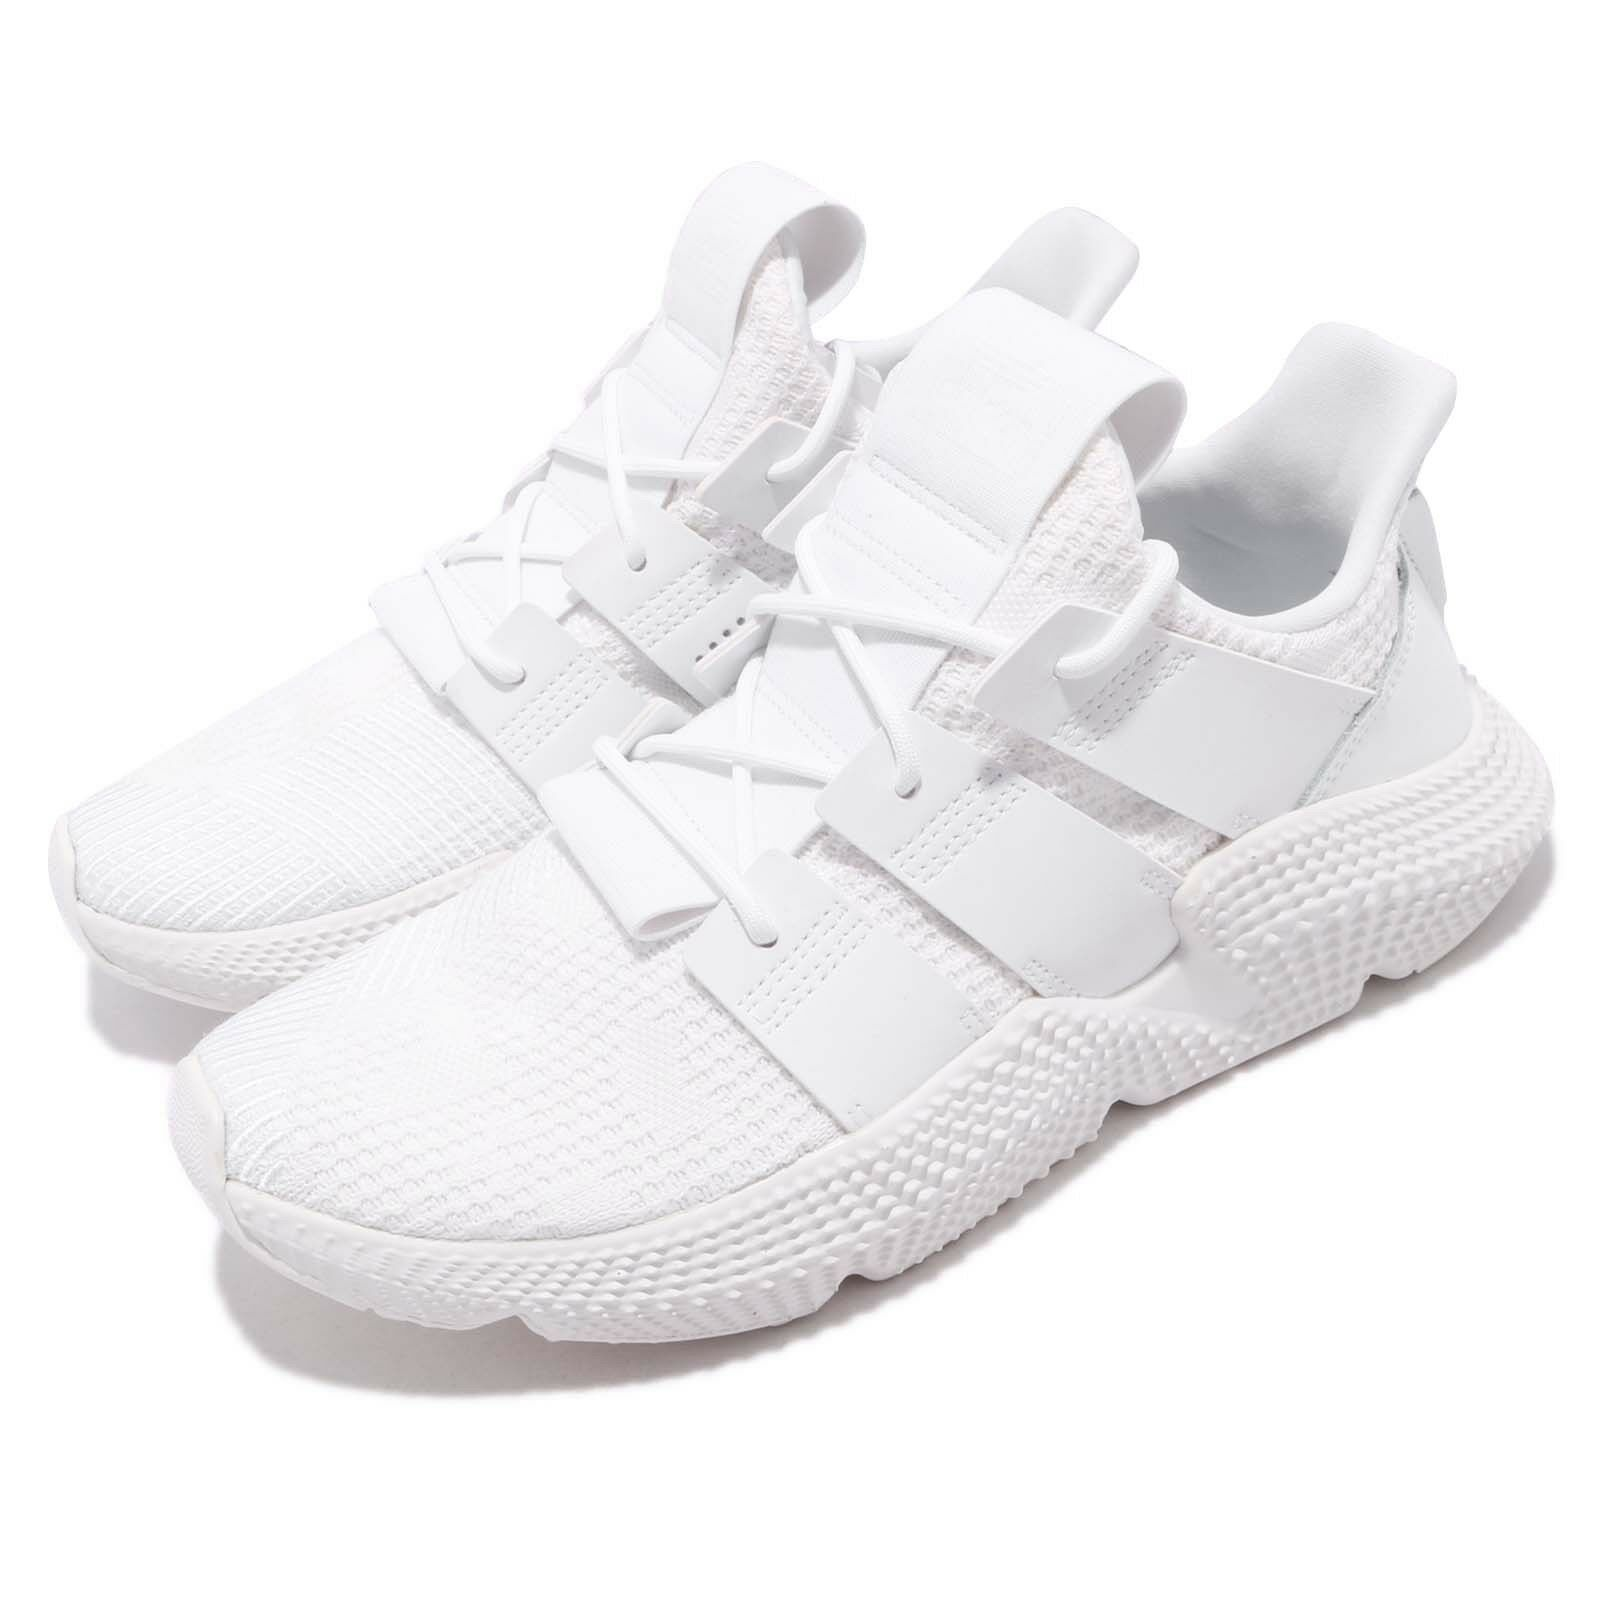 60% Rabatt Schuh Lifestyle Running Men Weiß Prophete